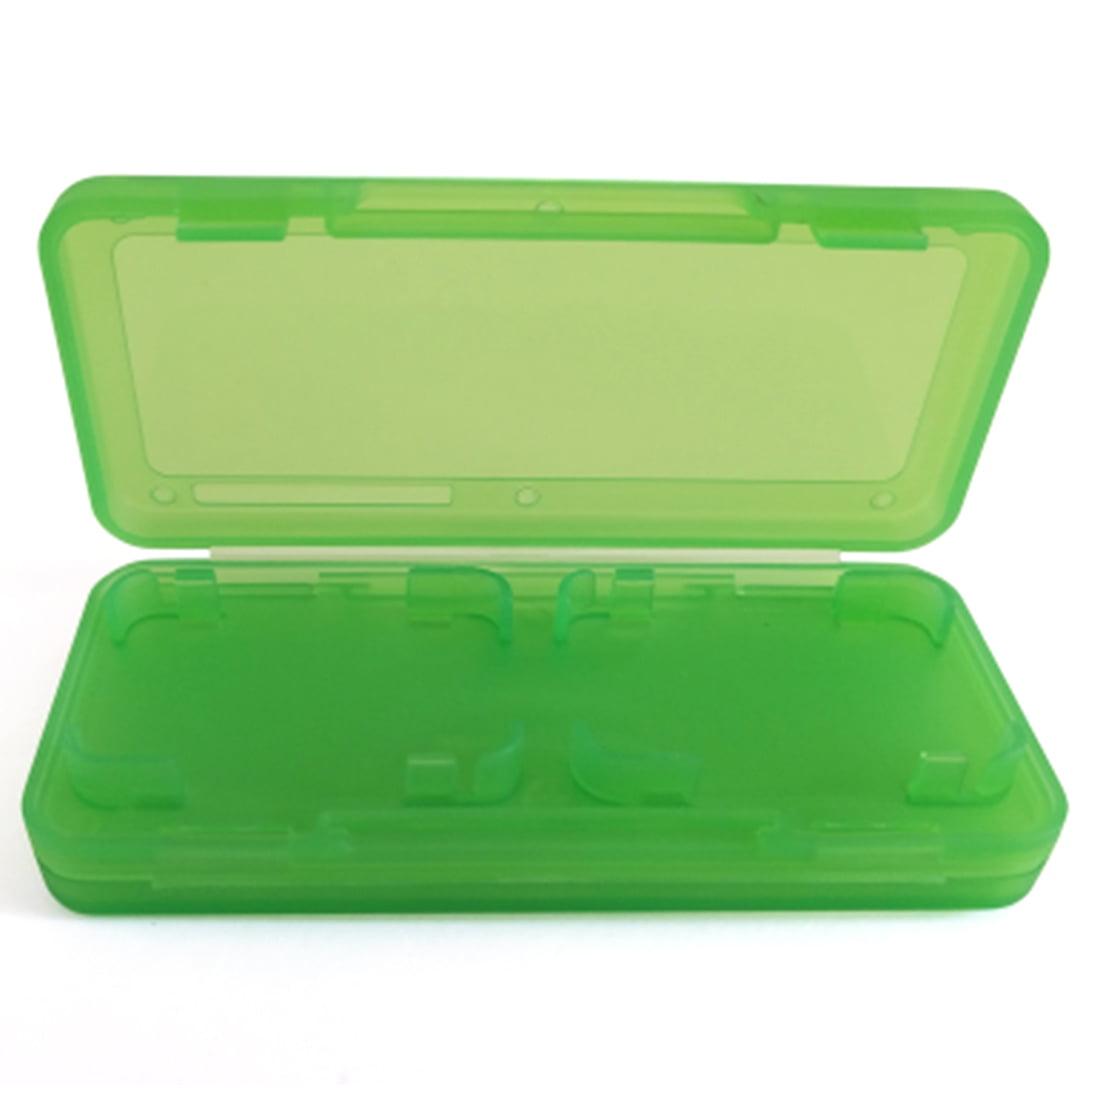 Indigo7 Authorized Nintendo Switch Game Card Hard Plastic Storage Protector Case Holds 4 - Green